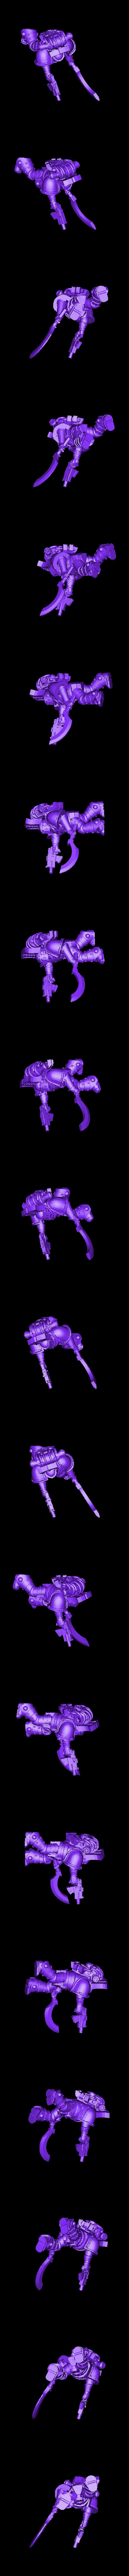 Aspiring_Sorc_Occult_Sword.stl Download free STL file Rubric Marines • 3D printer design, Mazer